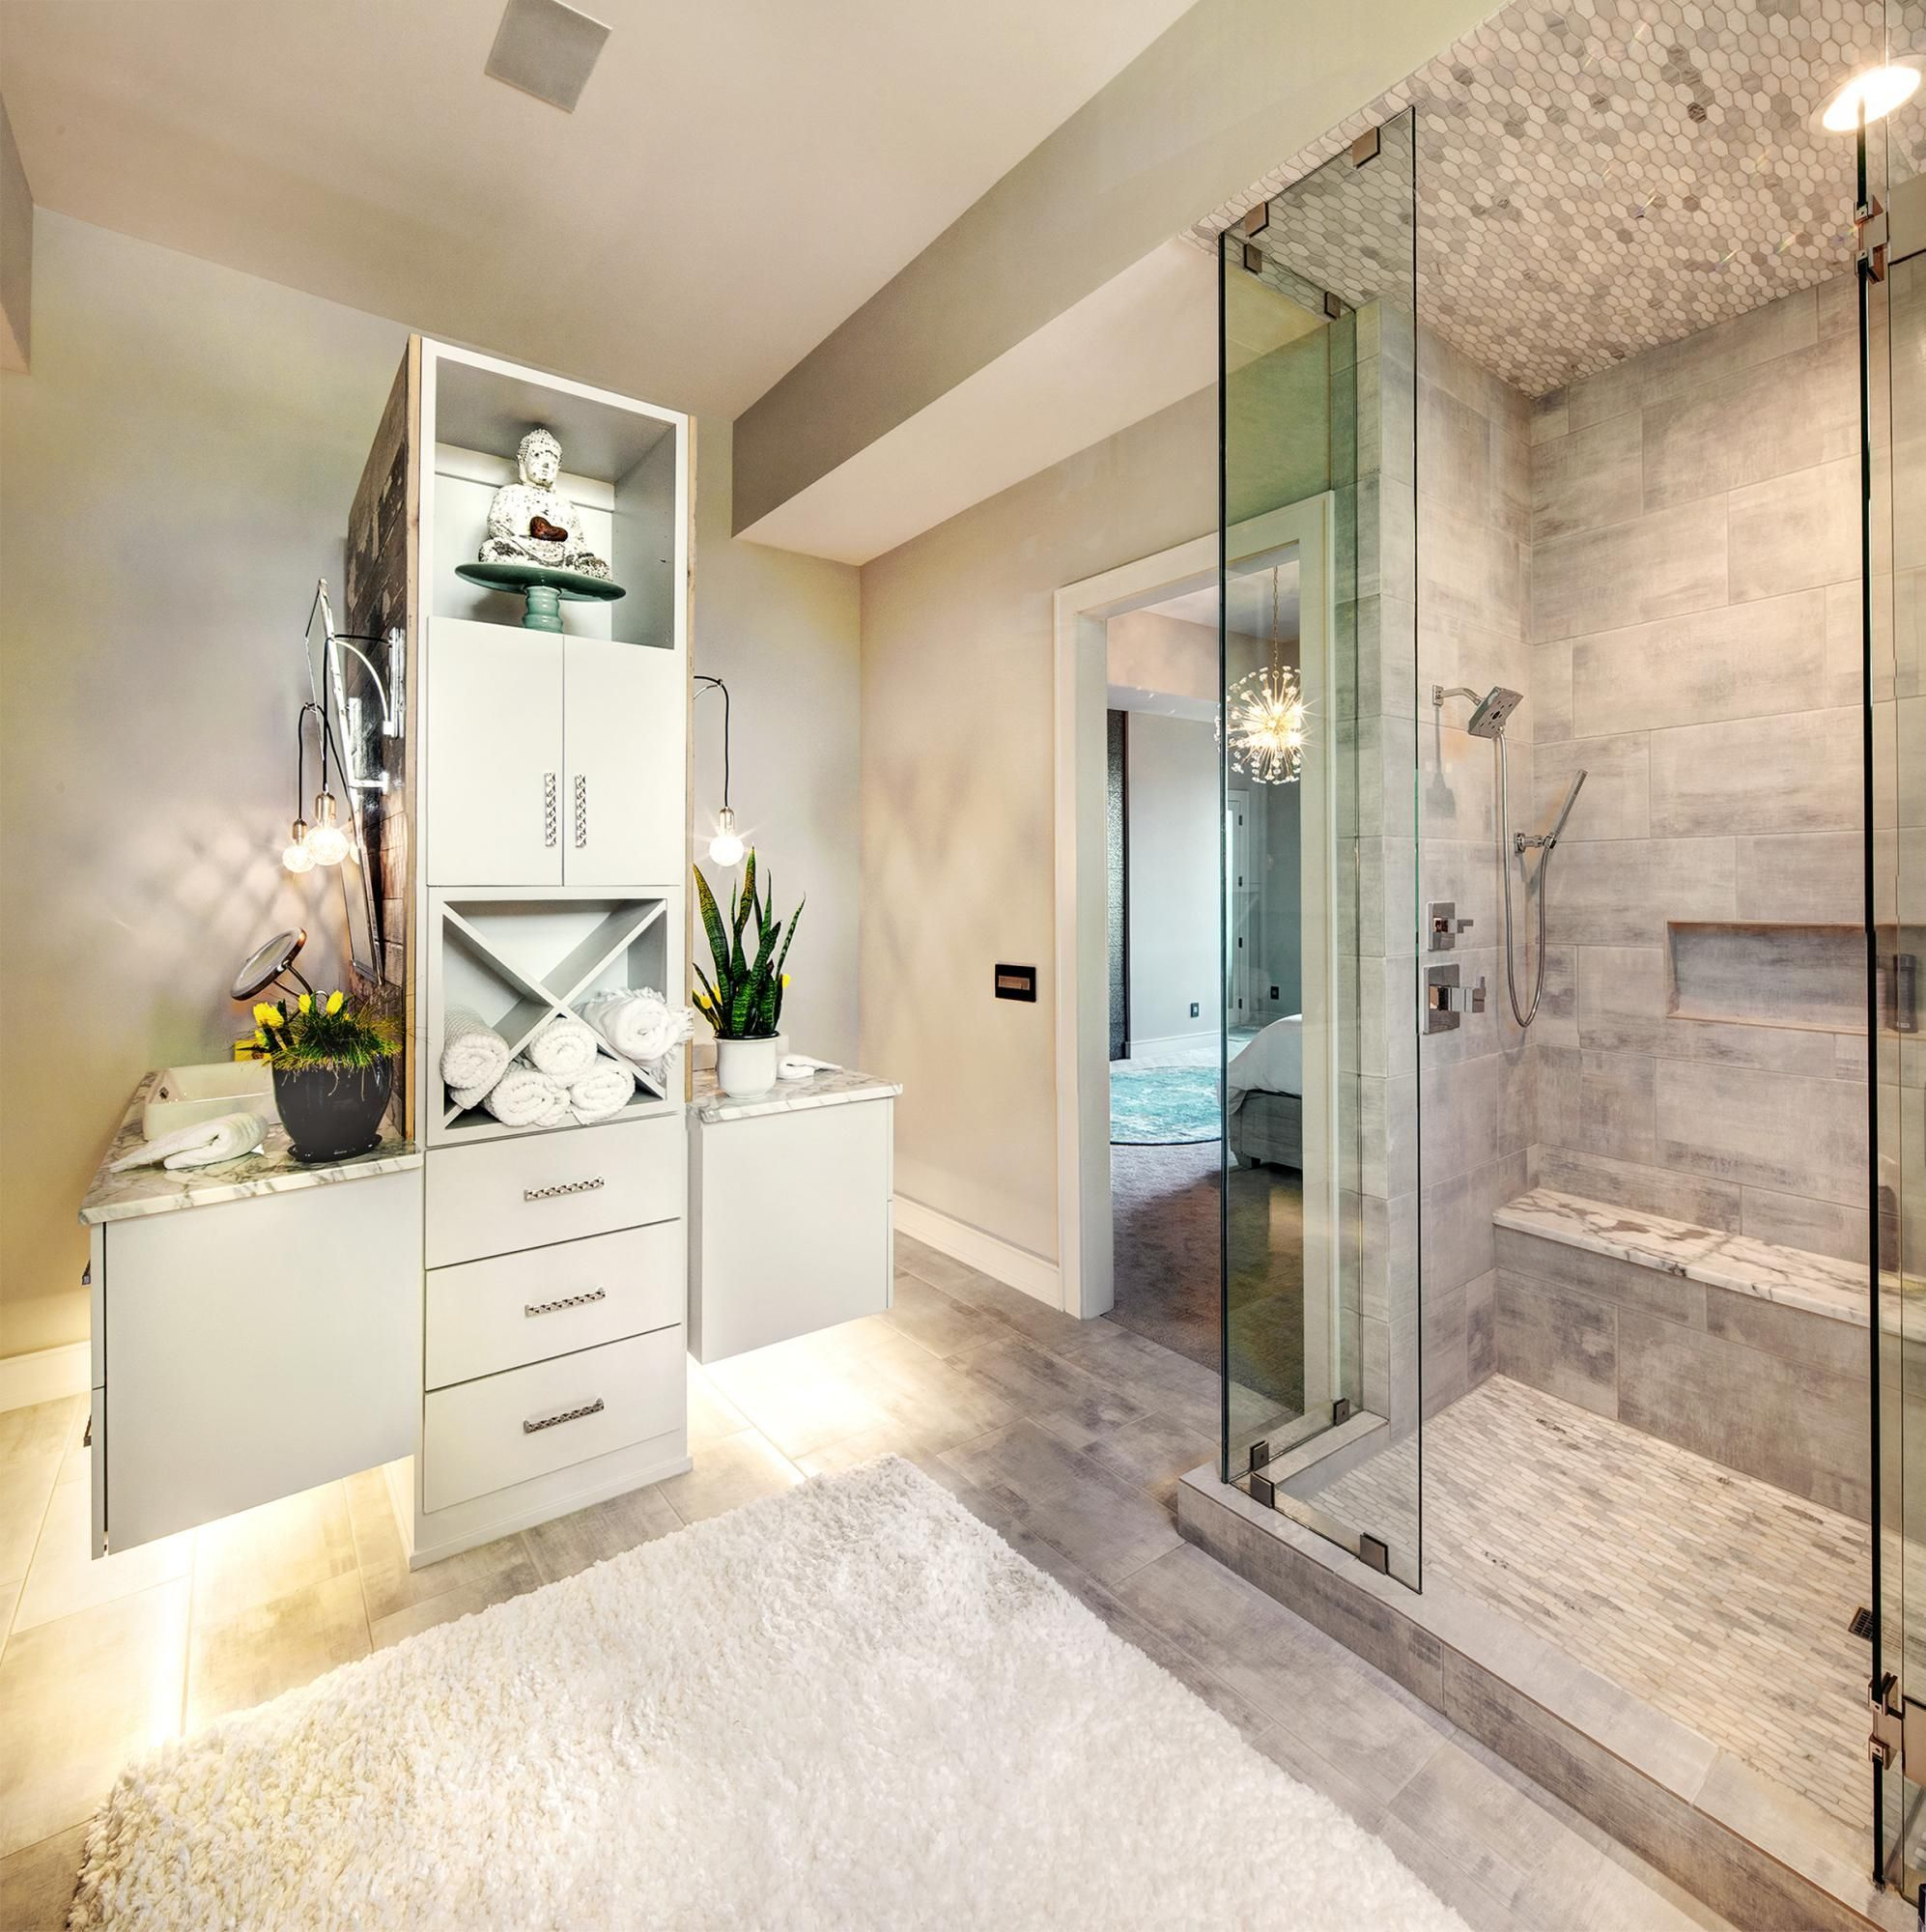 Bathrooms Photo Gallery  Custom Homes in Kansas City KS  Starr